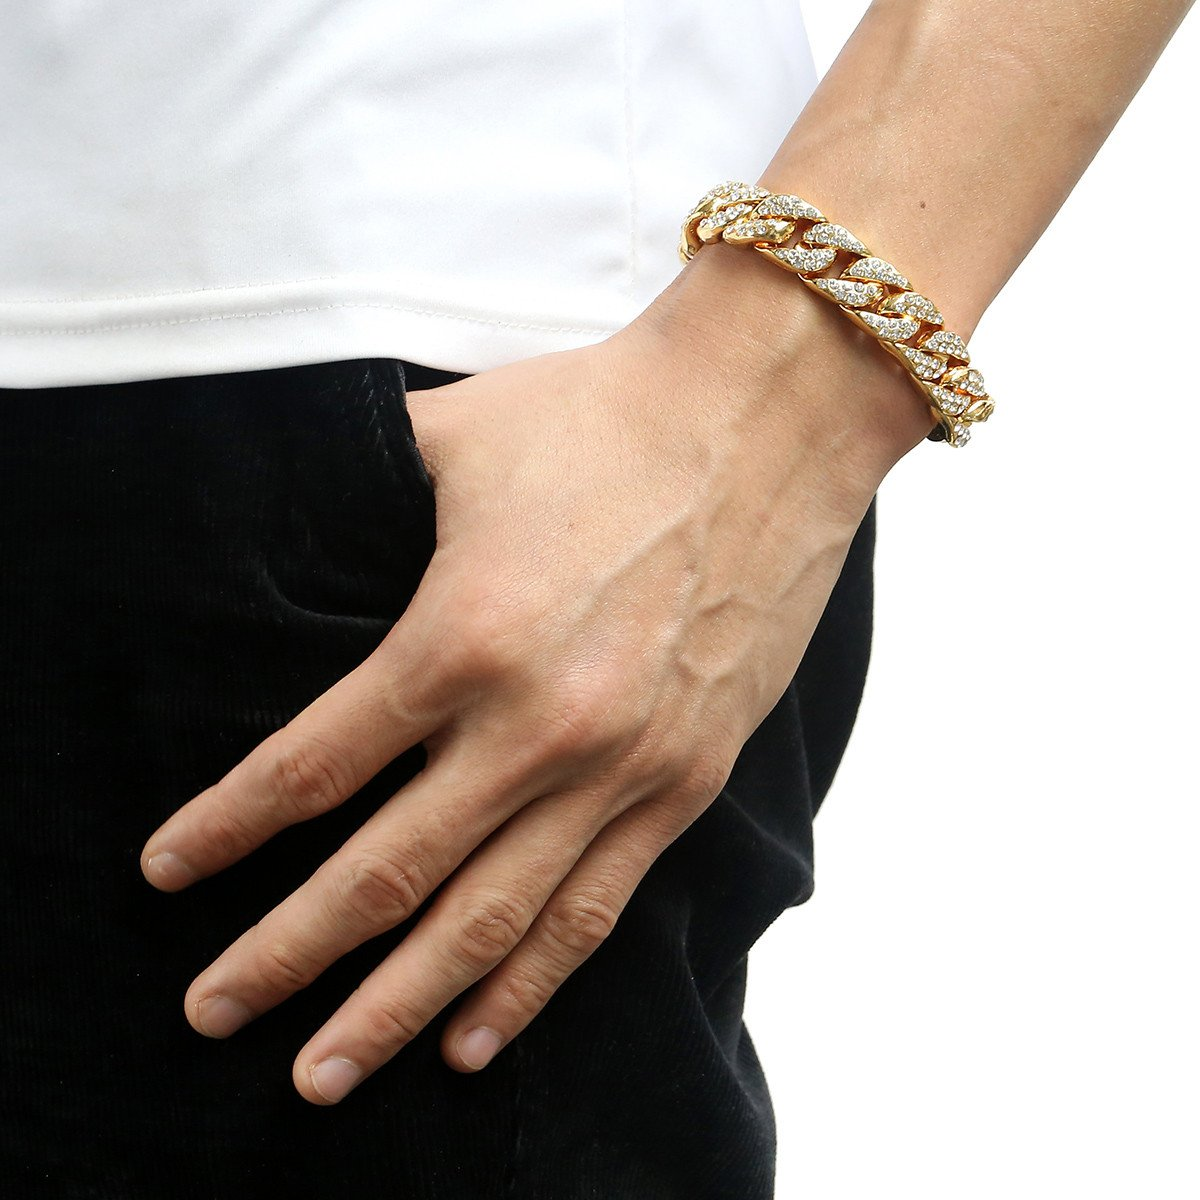 Trendsmax Curb Cuban Verknüpfung Damen Herren Halskette Armband Kette SetWeißes Gold überzogen GF Iced Out Hip Hop Pflastern Strasssteine Bling Schmuck 14mm EURKS239/_820B